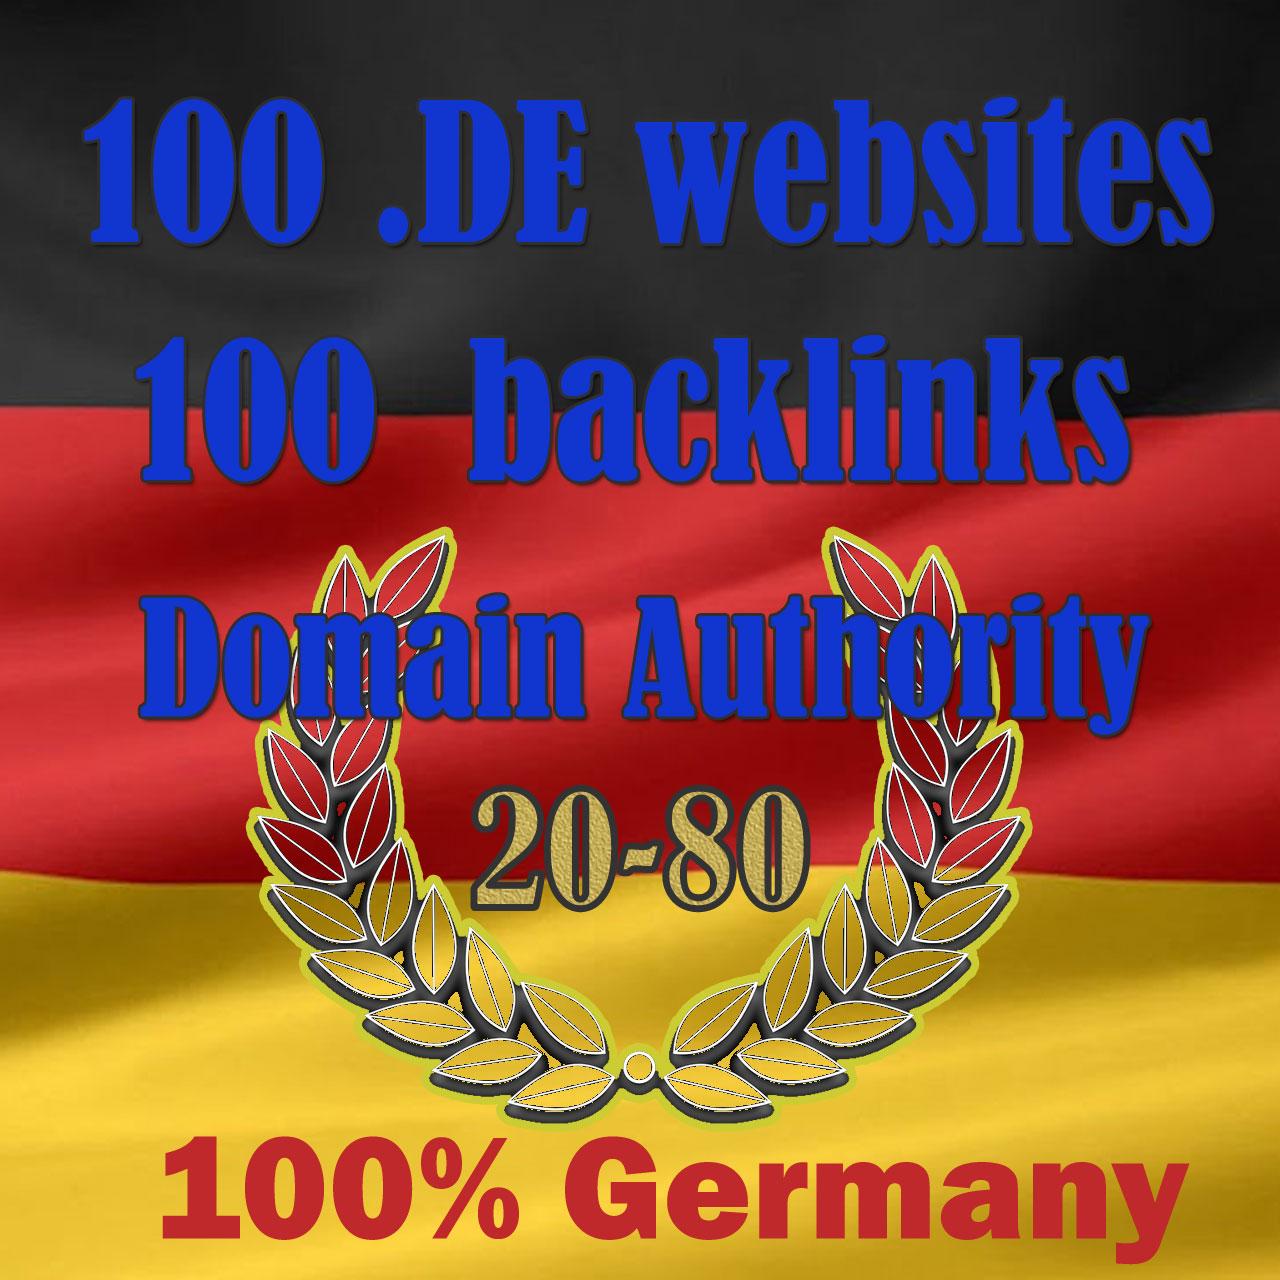 High DA German seo backlinks from 100 DE websites high authority